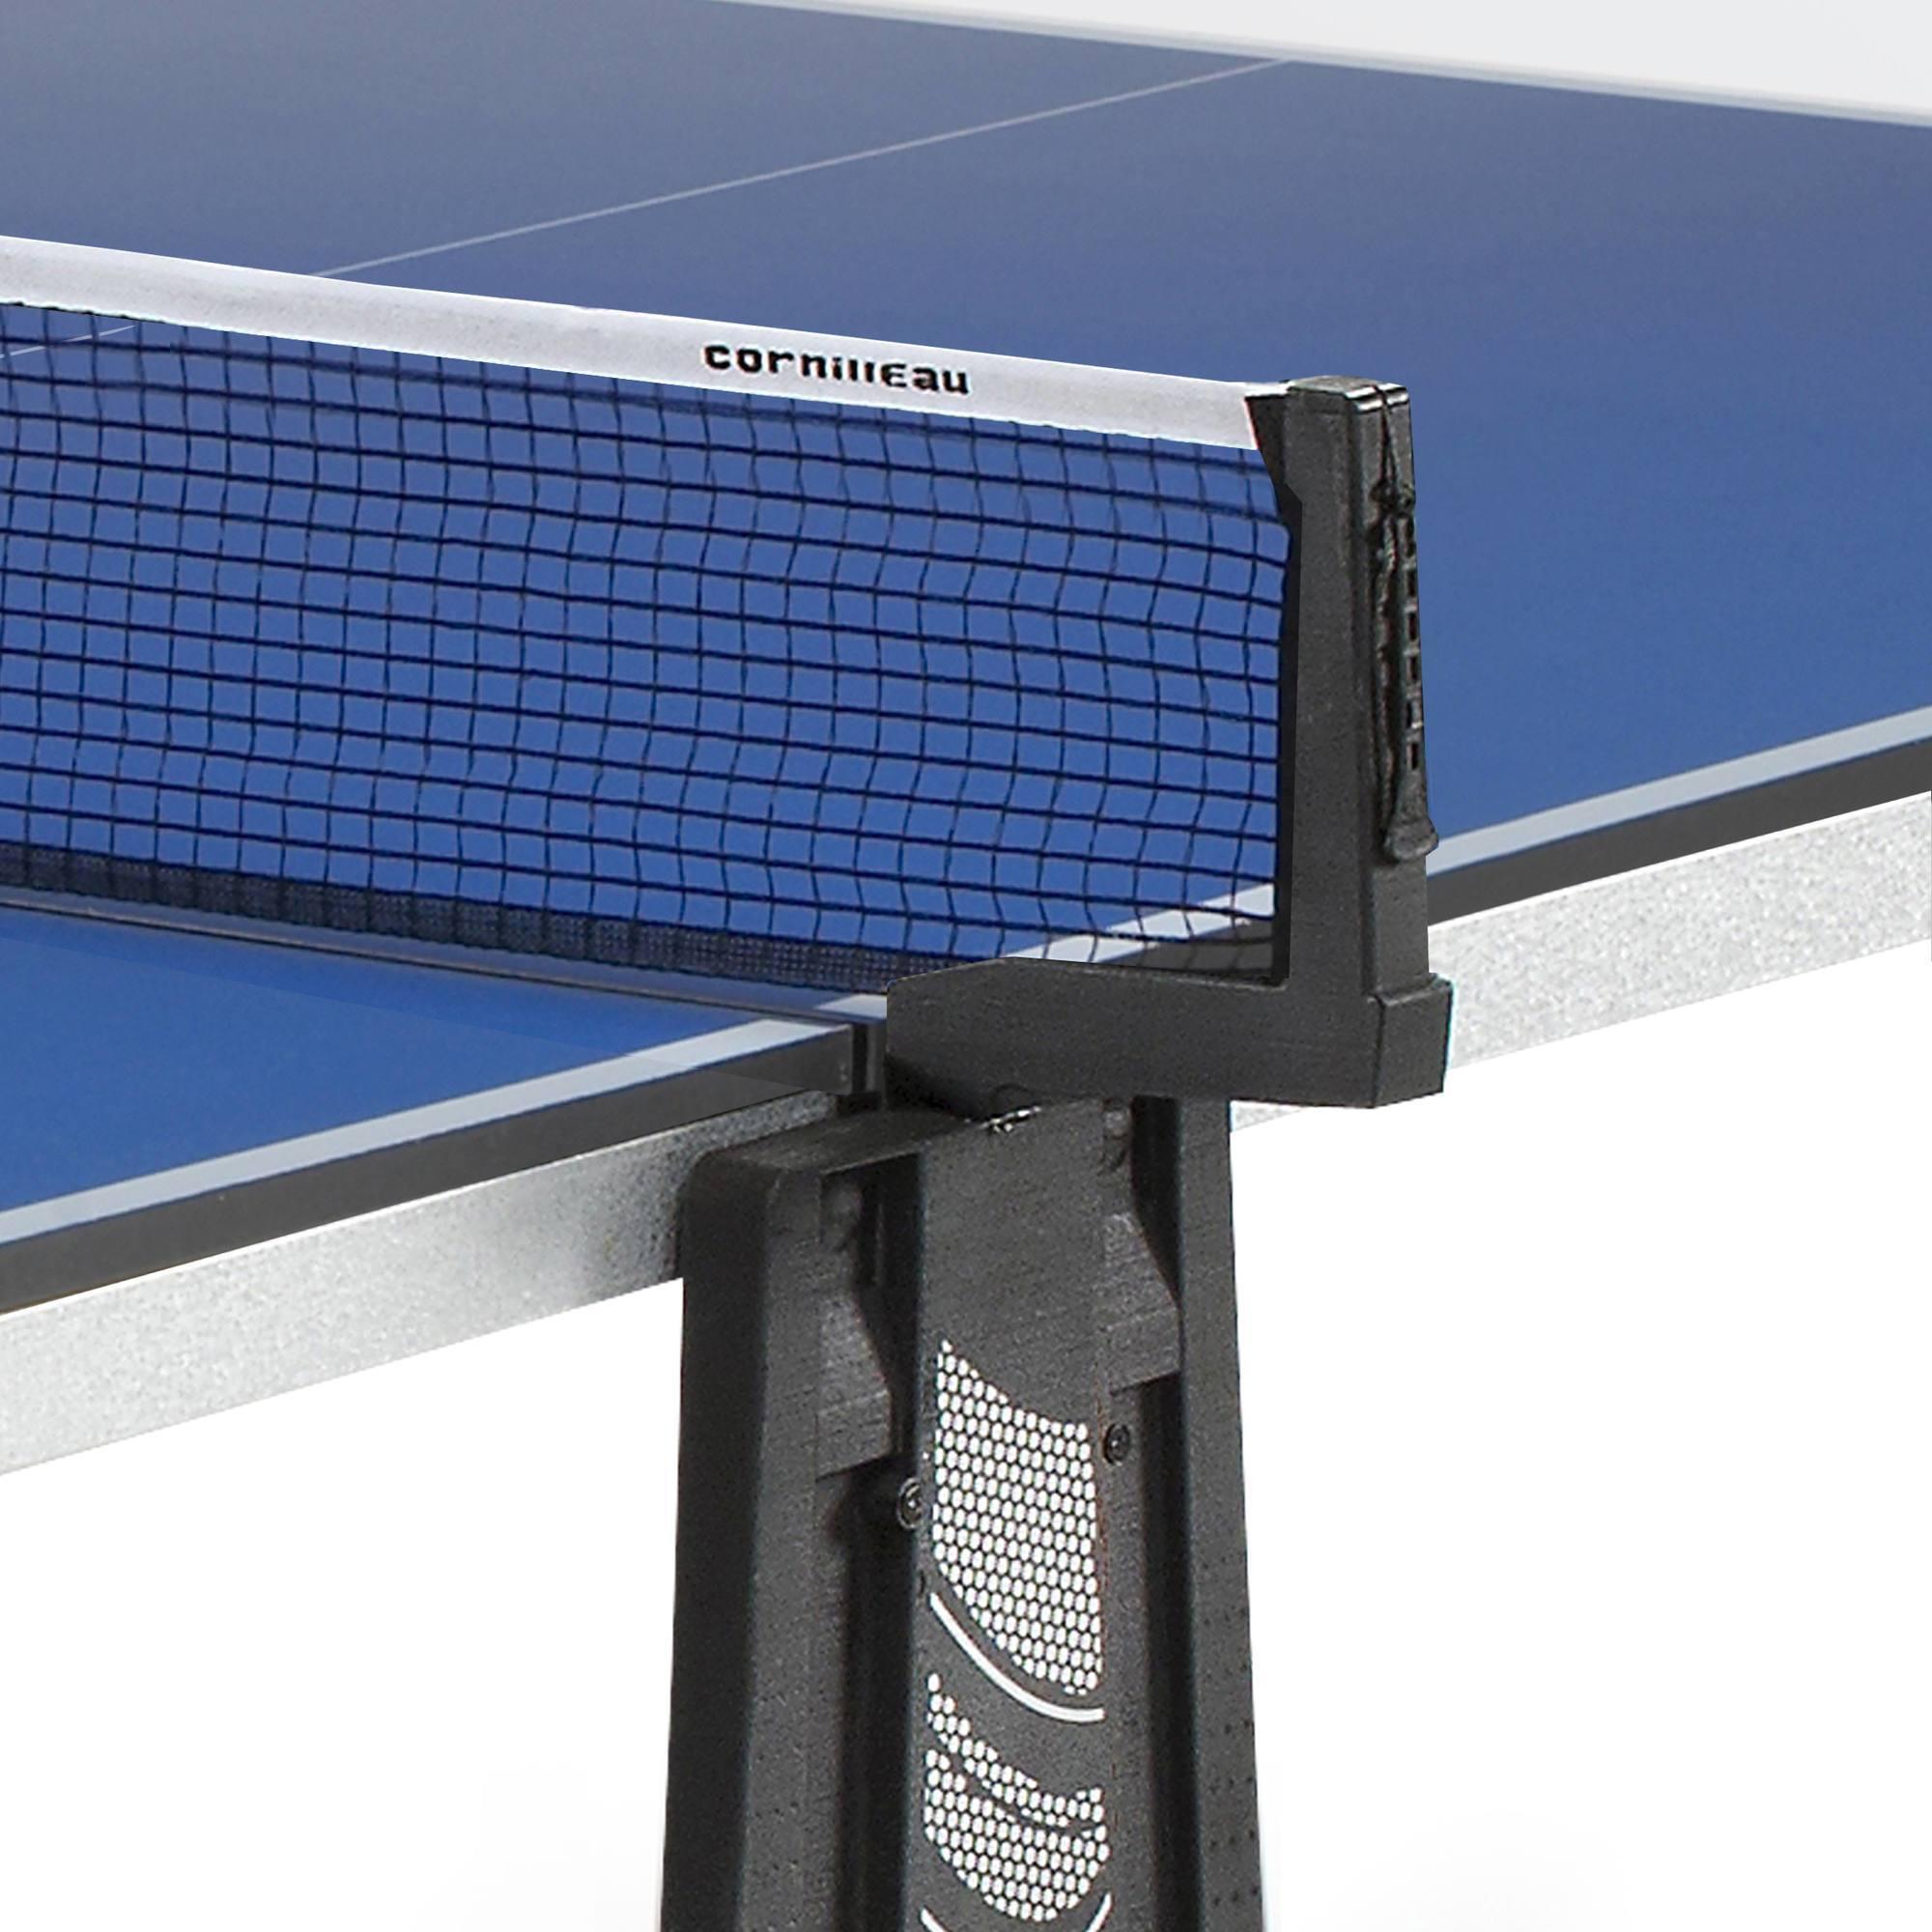 Table de tennis de table interieur cornilleau 250 indoor for Club de tennis interieur saguenay